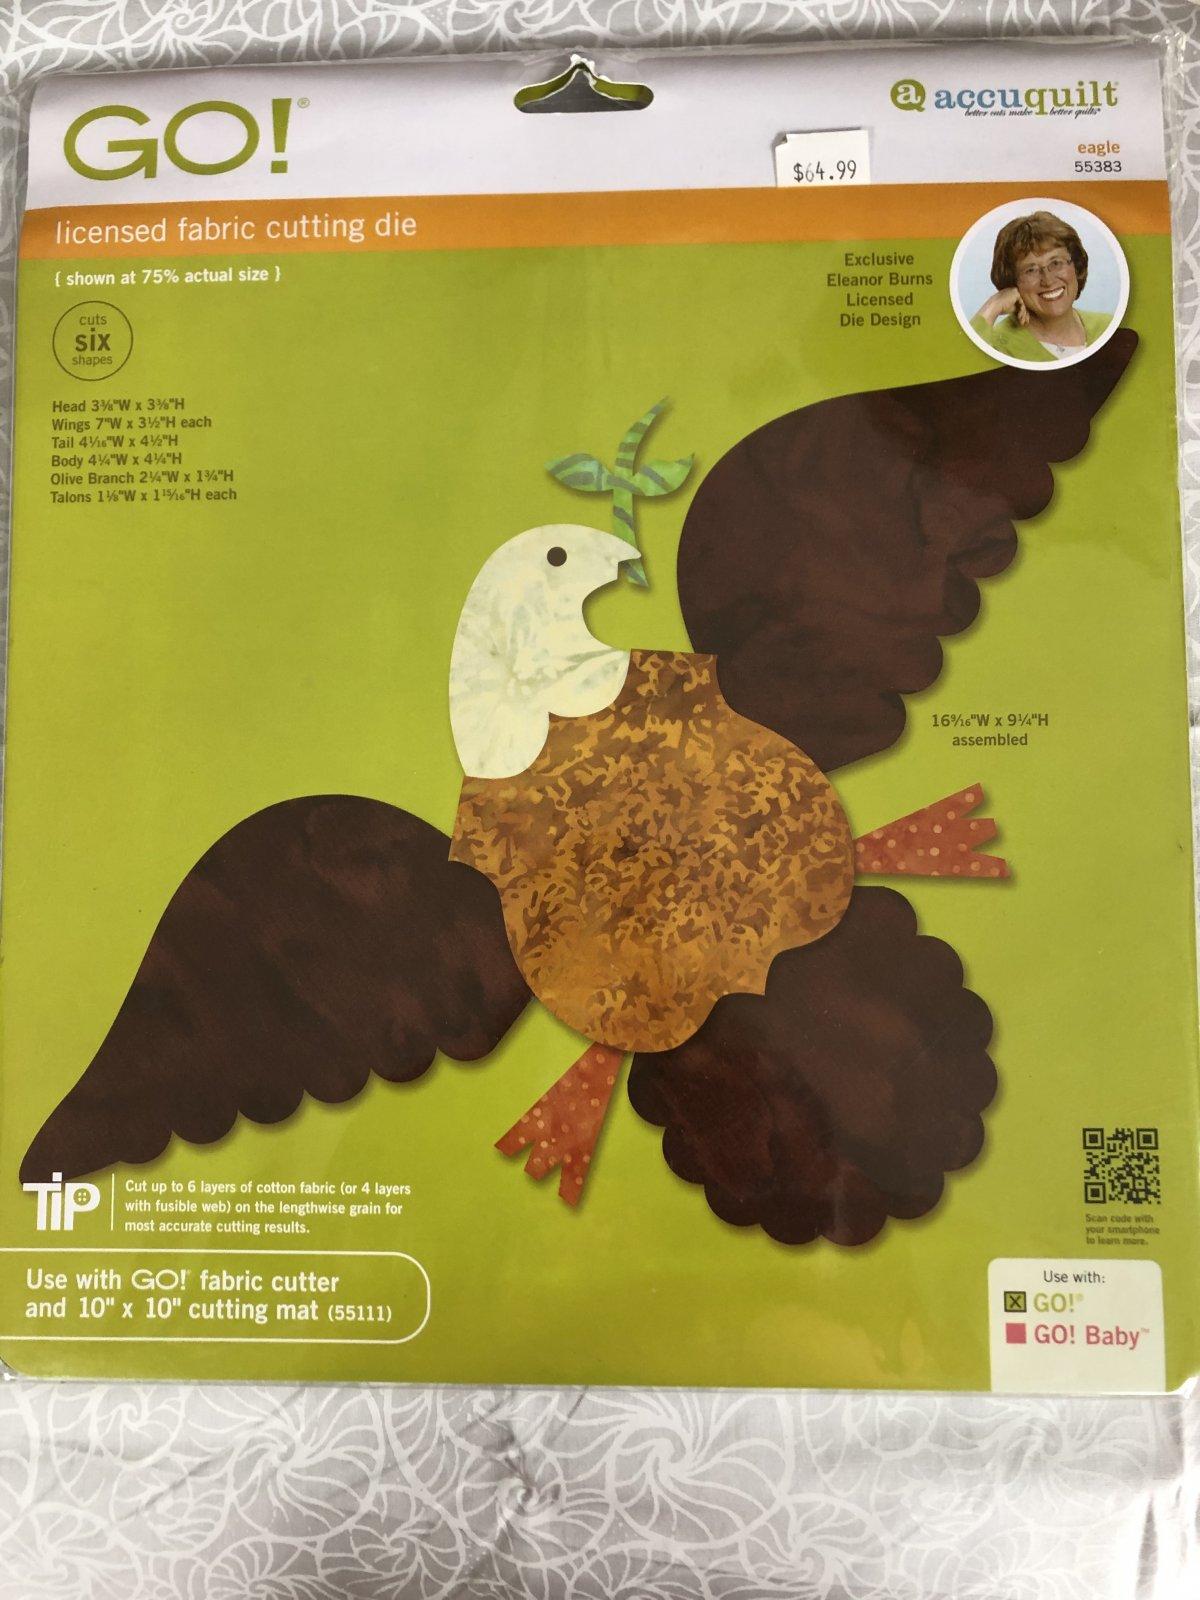 Accuquilt Go! Eagle 55383 Fabric Cutting Die